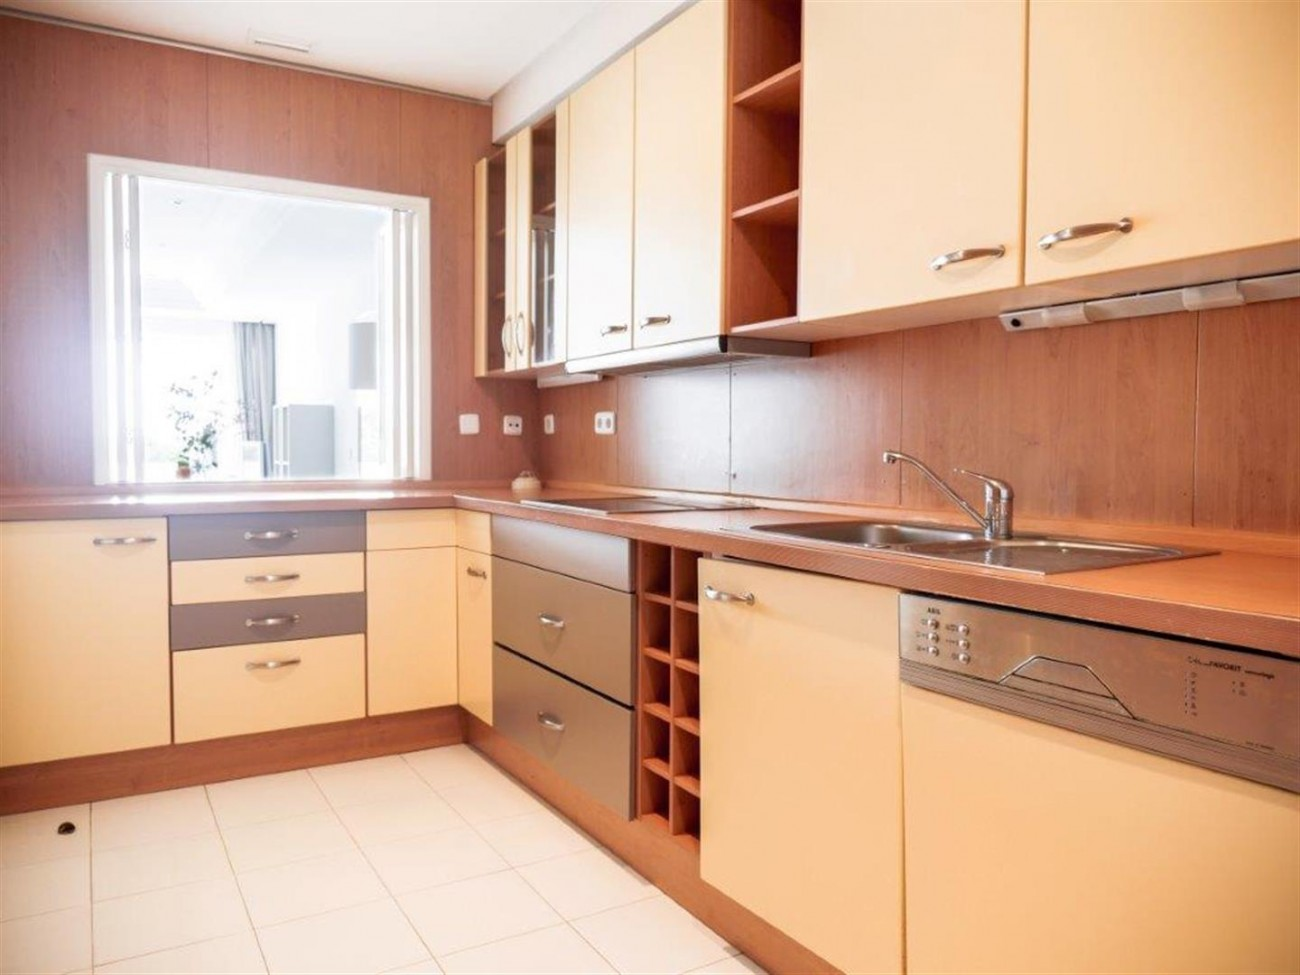 A5579 Frontline beach duplex penthouse Marbella 10 (Large)